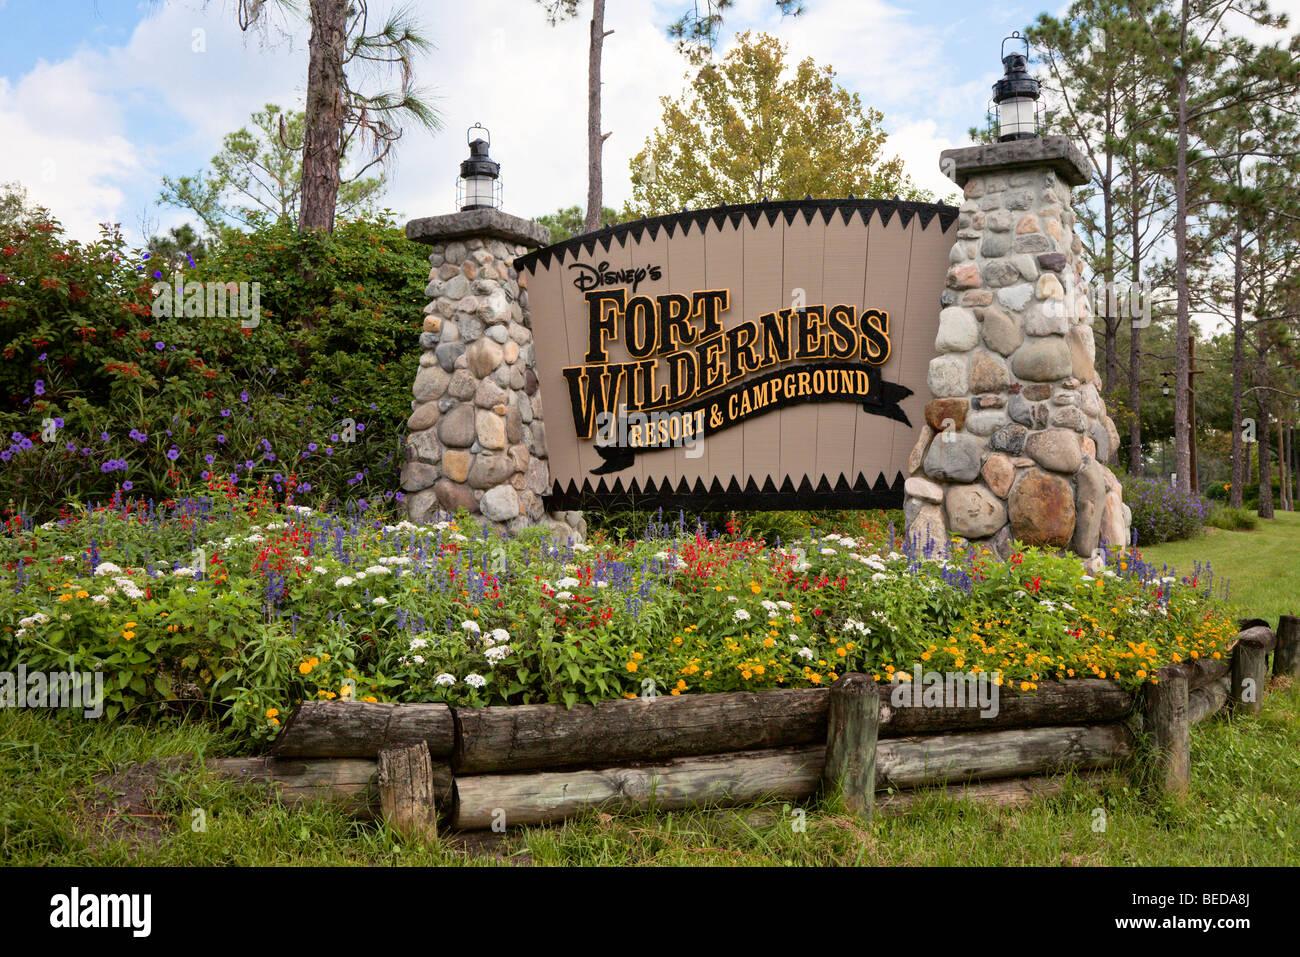 Fort Wilderness Resort Orlando Stock Photos & Fort Wilderness Resort ...